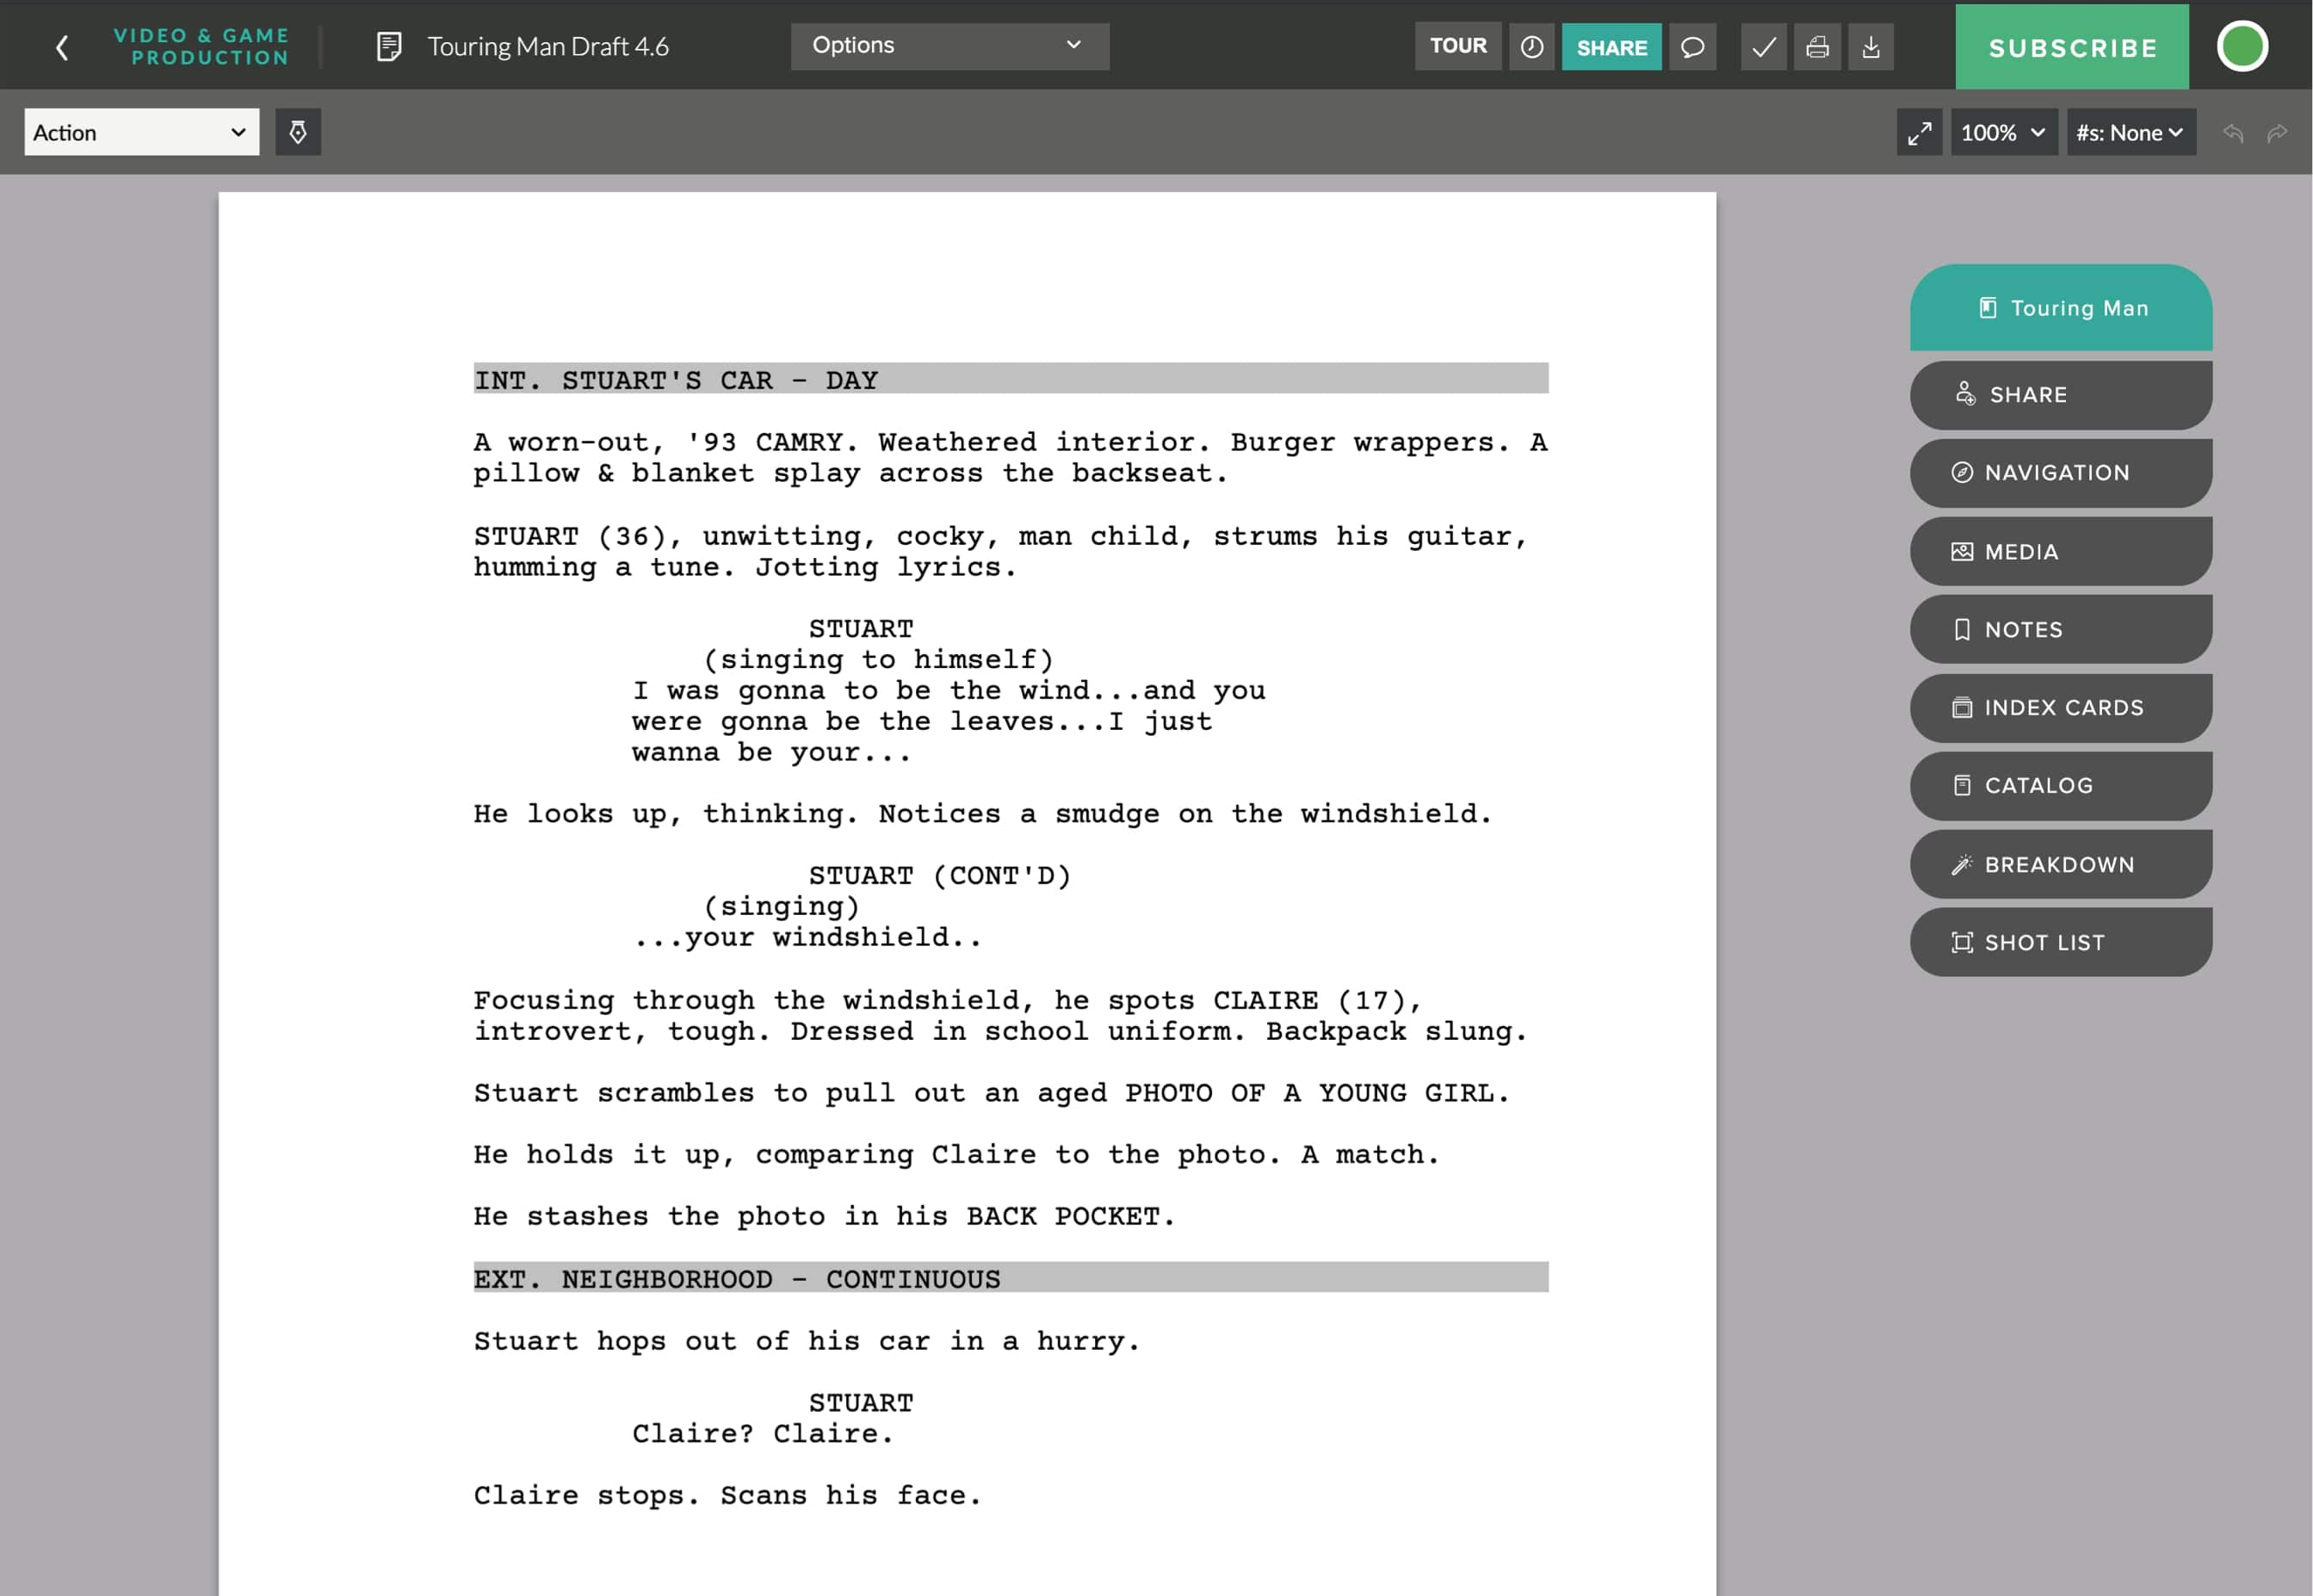 Best Alternative to Celtx? Meet StudioBinder's Free Screenwriting Software